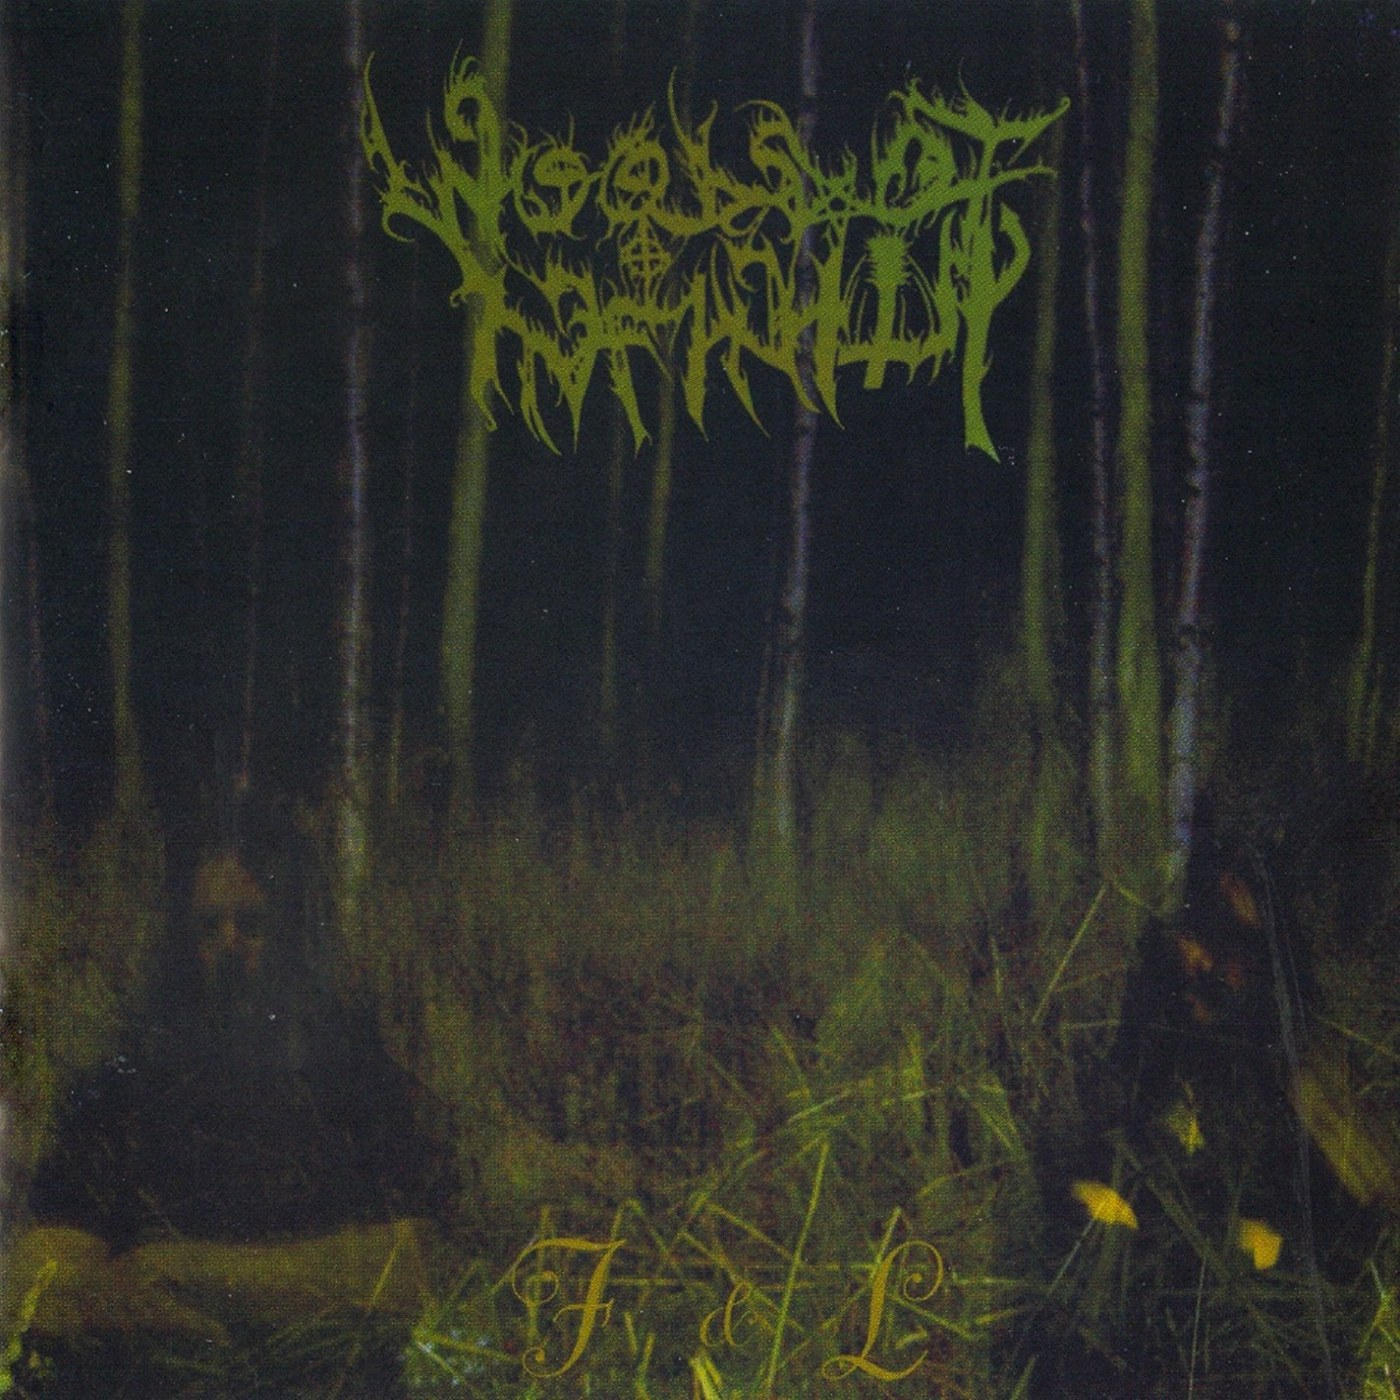 Reviews for Woods of Infinity - Förintelse & Libido